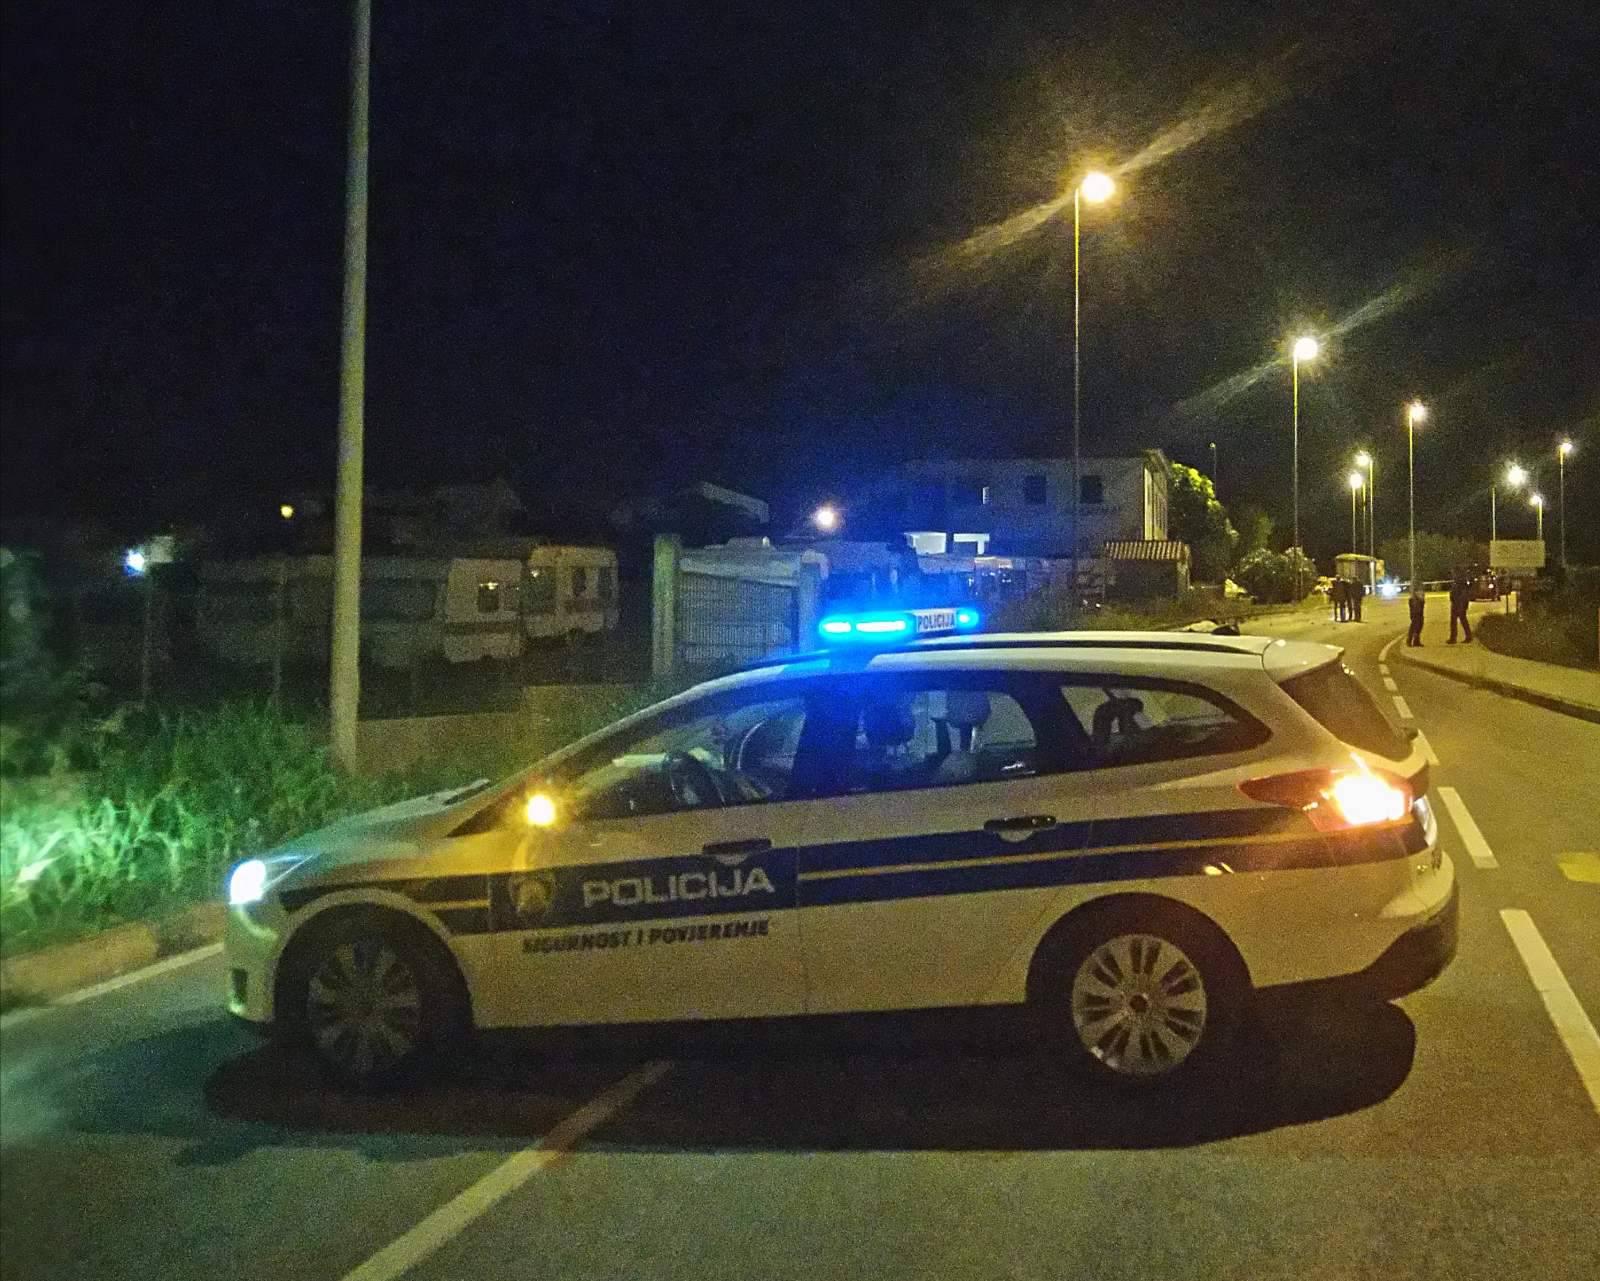 Vikend rekorder (46) u Istri napuhao je čak 2.39 promila